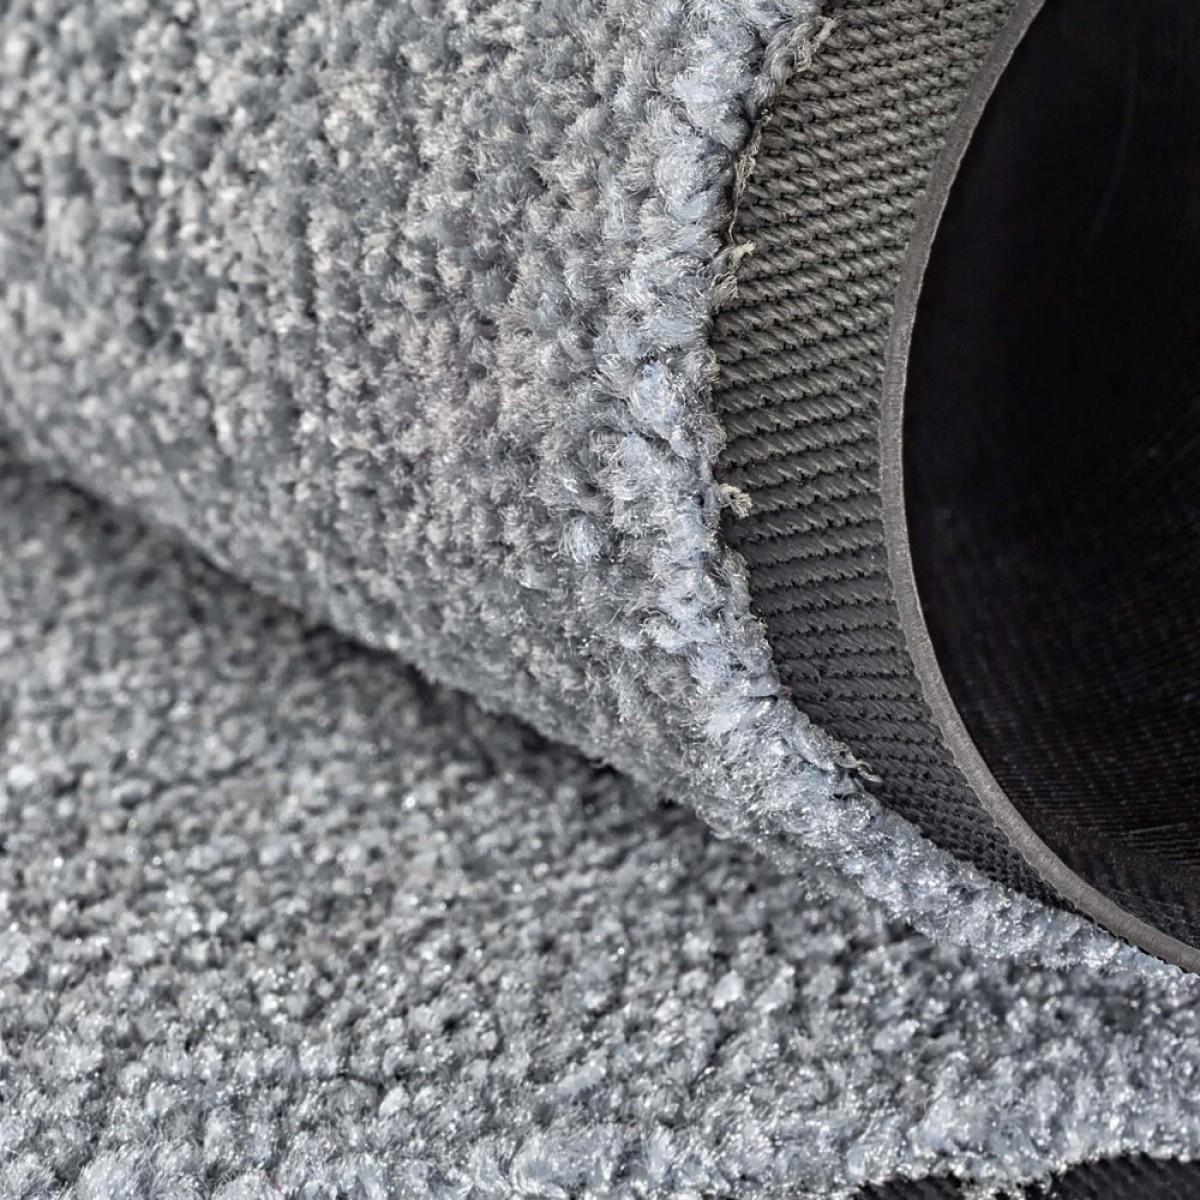 Schmutzfangmatten Außenbereich schmutzfangmatten aussenbereich hausdesigns co